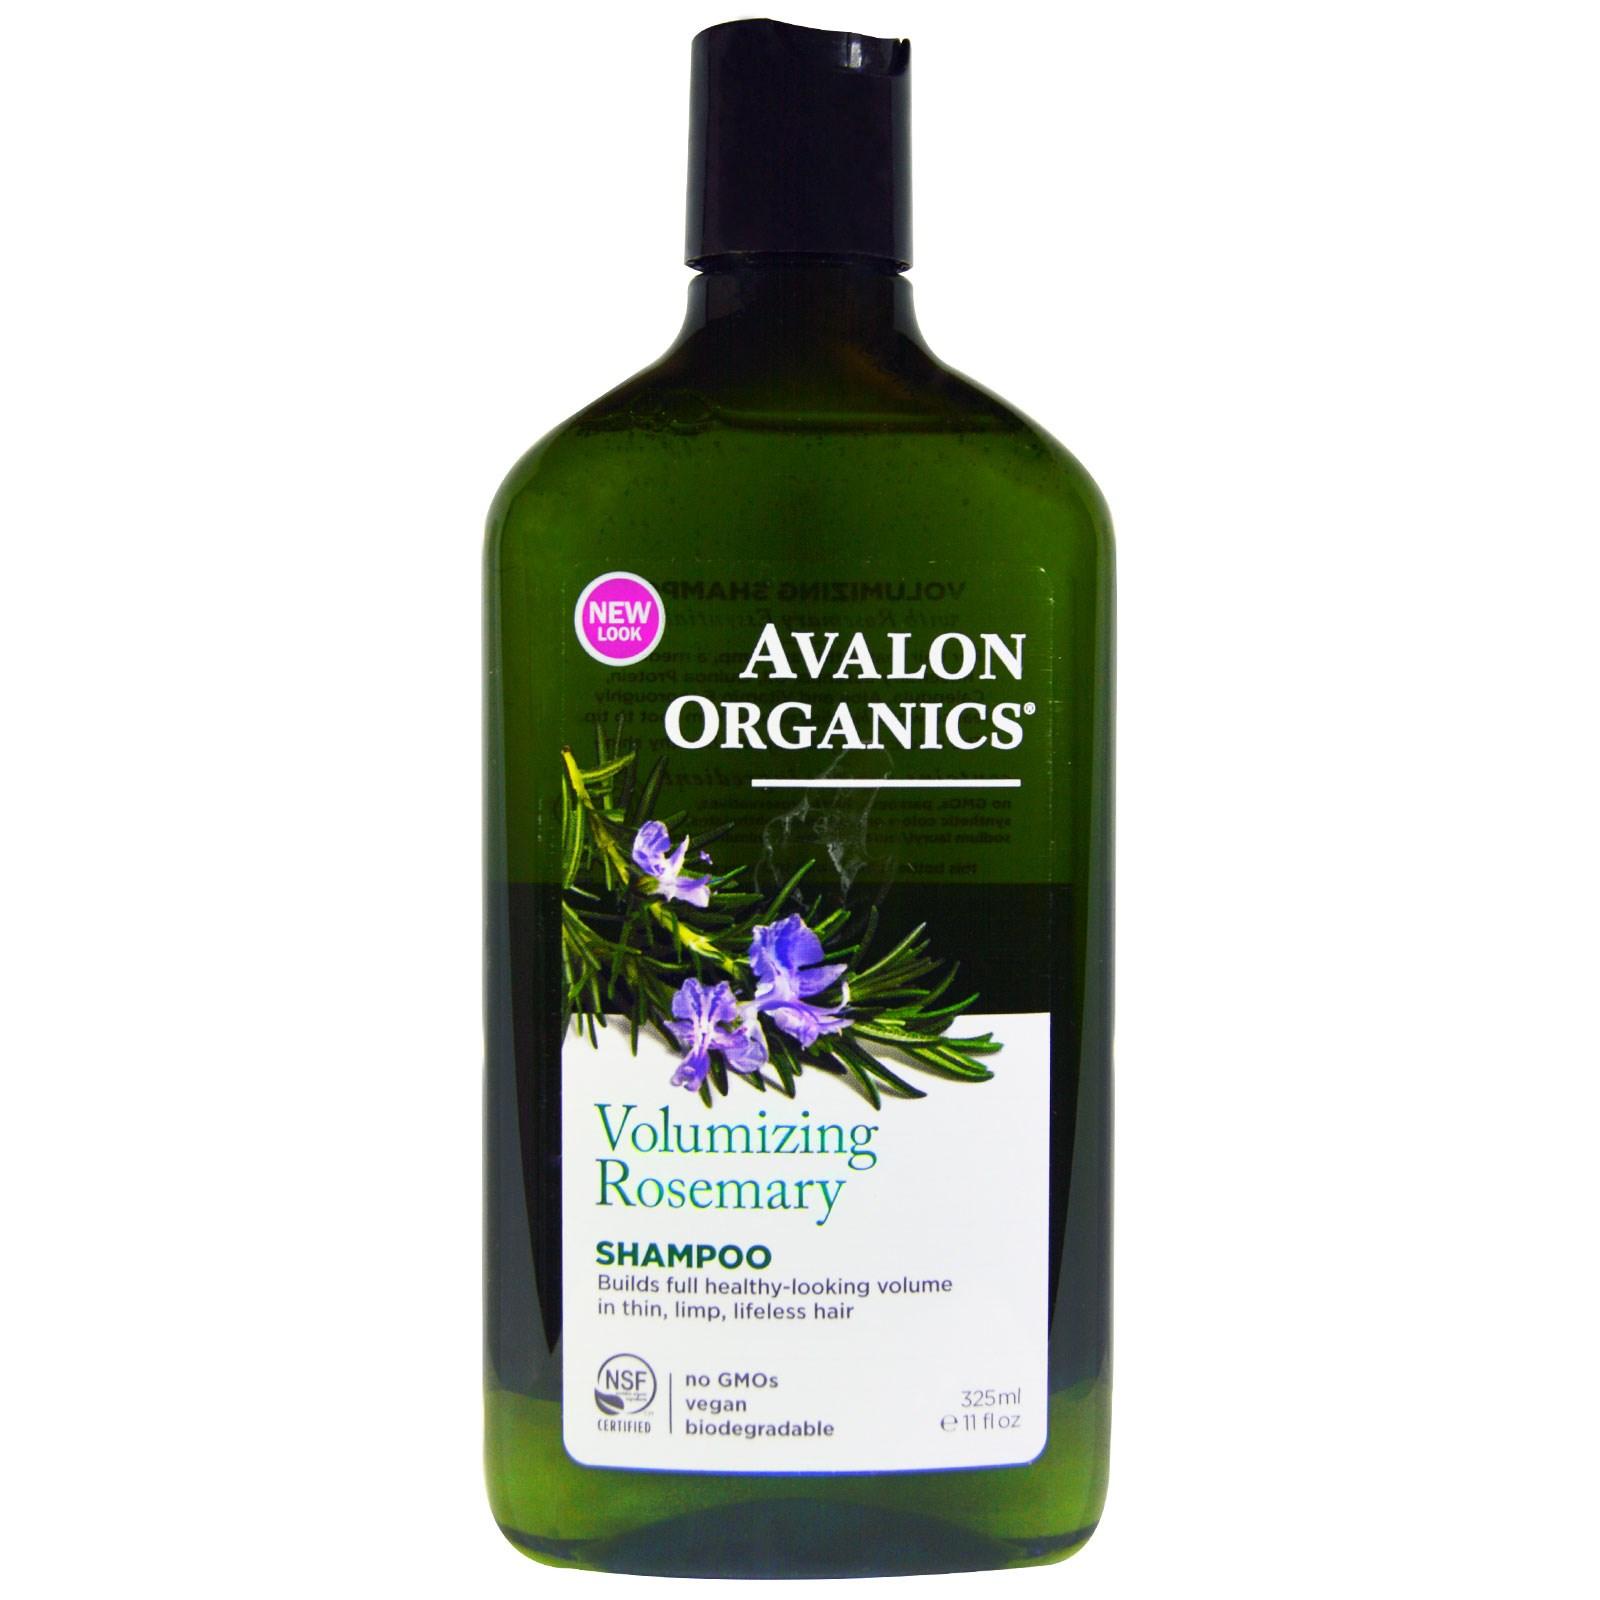 Avalon Organics, Shampoo, Volumizing, Rosemary, 11 fl oz (325 ml) - iHerb